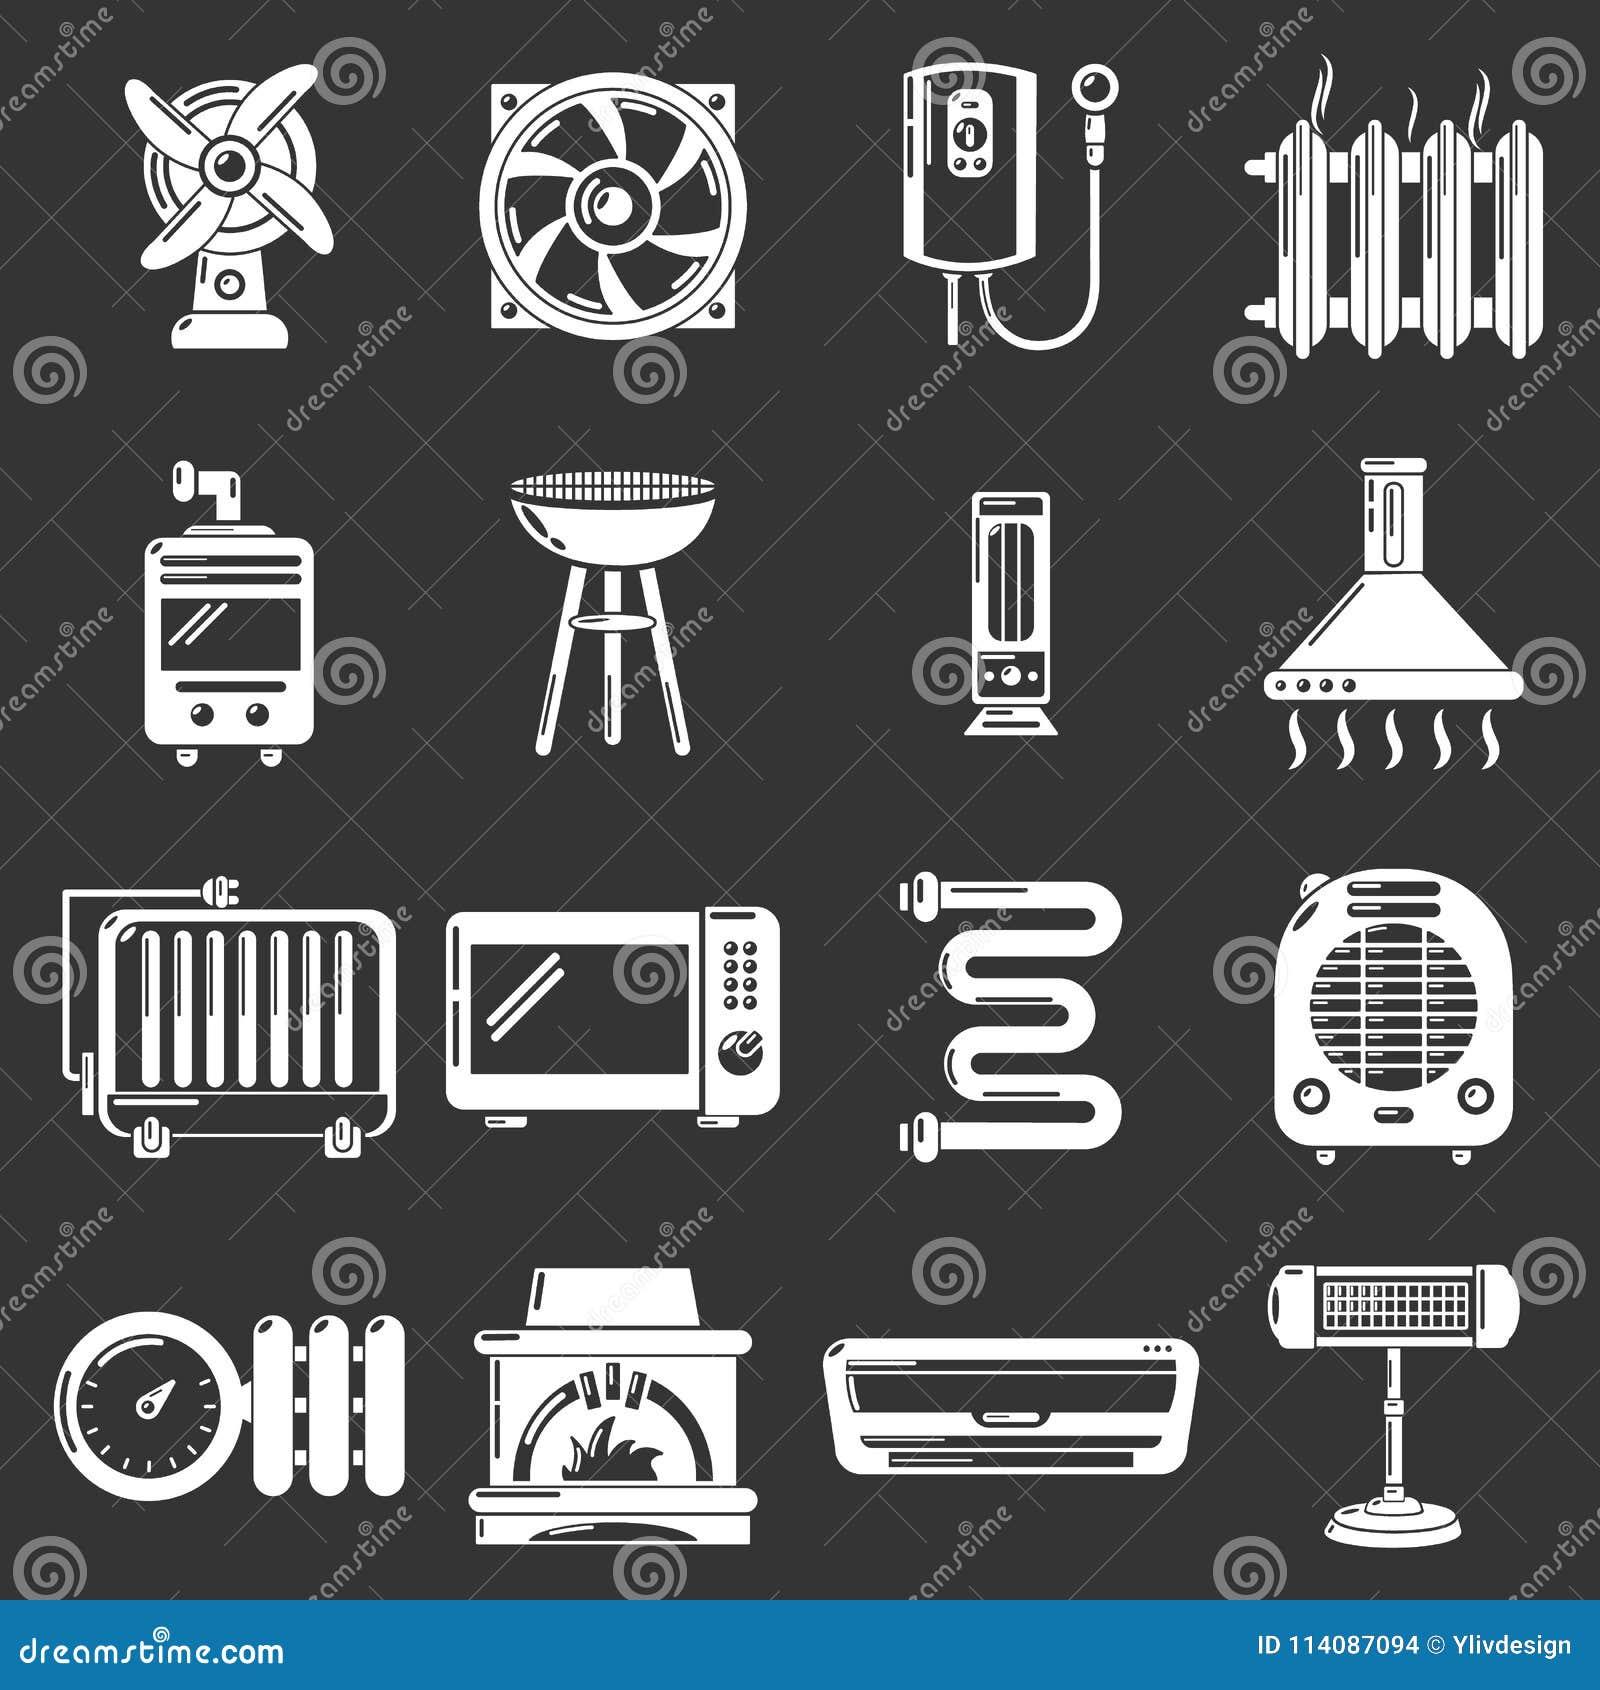 Heat cool air flow tools icons set grey vector